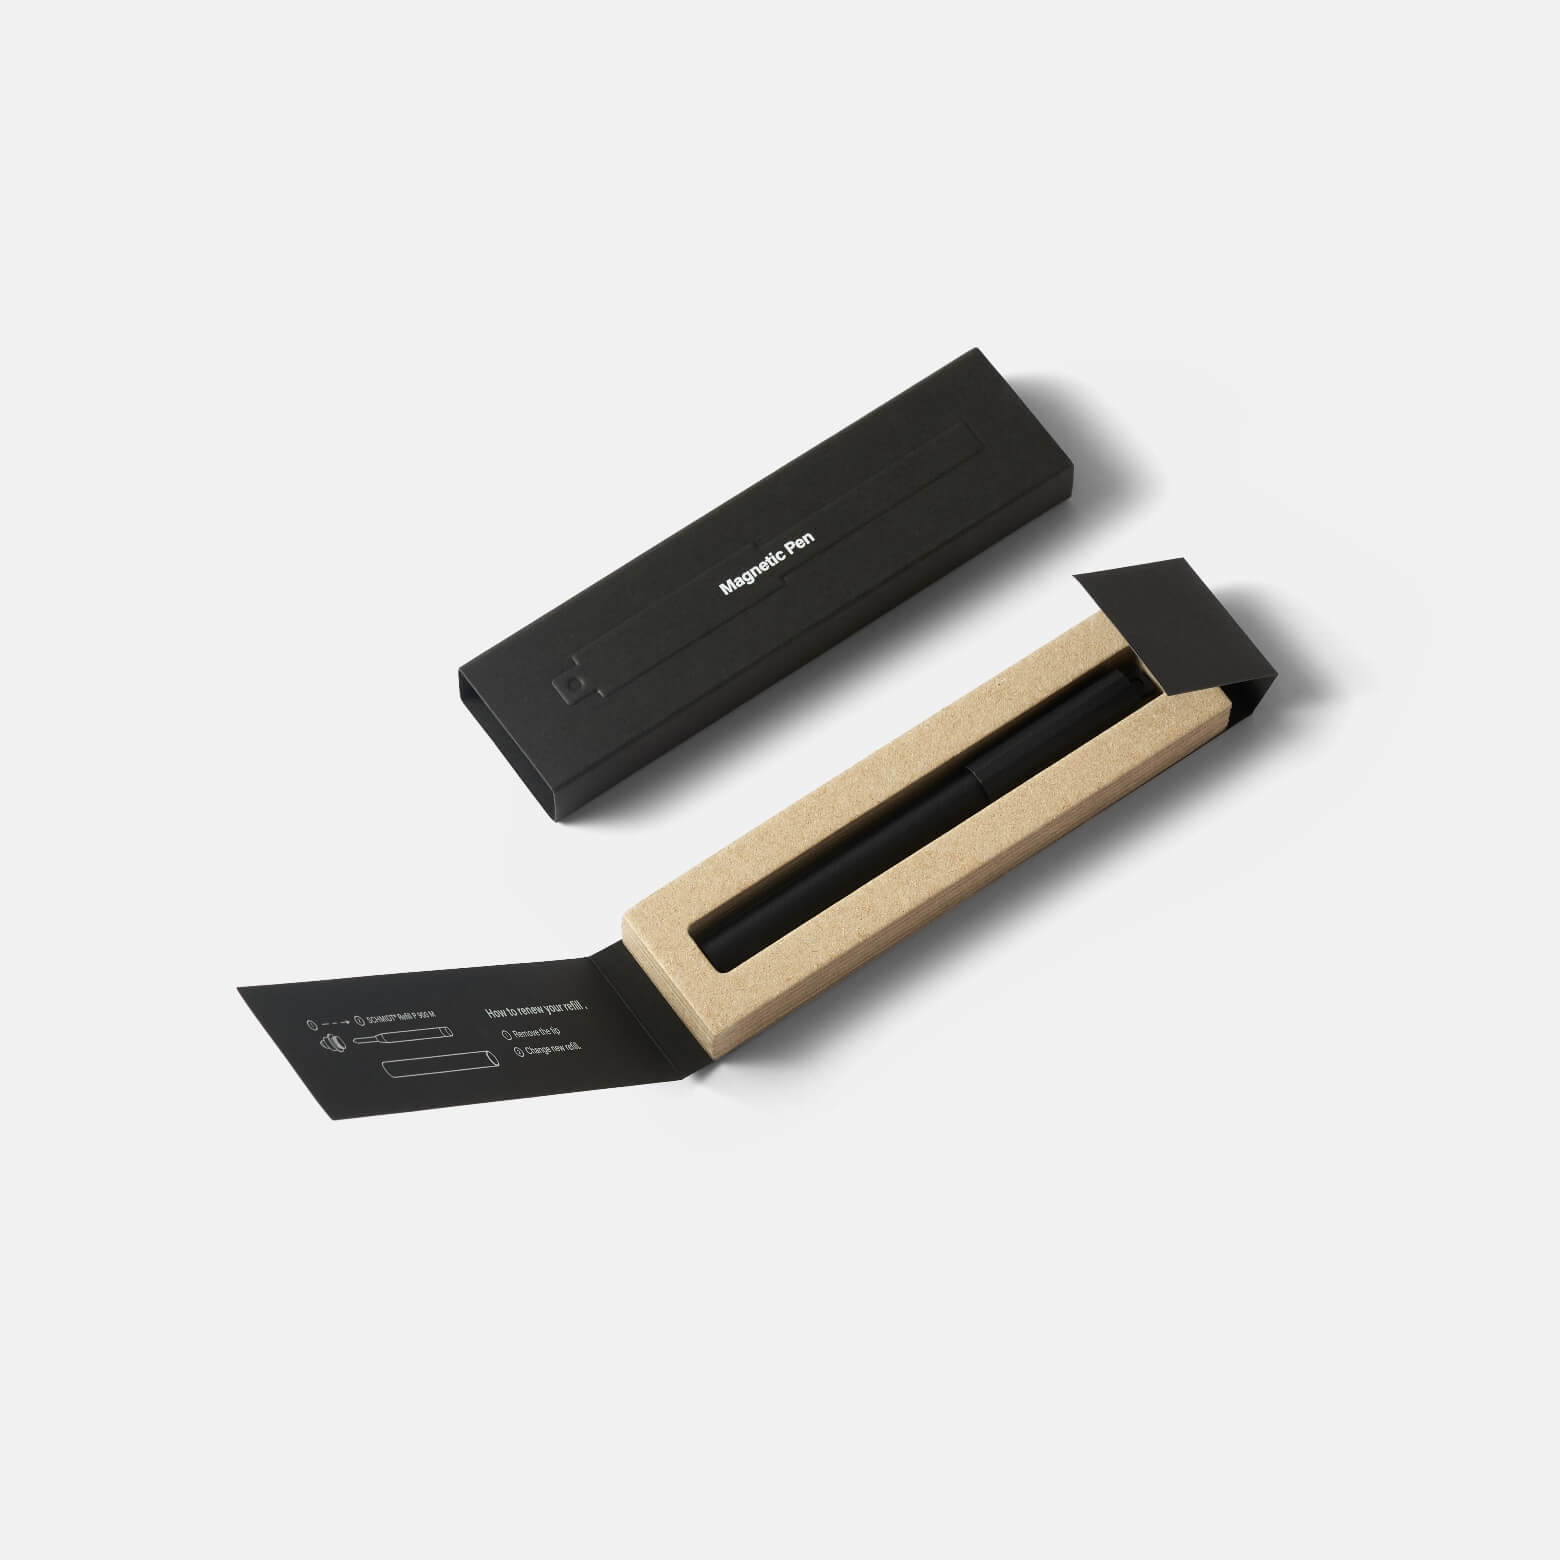 HMM Magnetic — алюминиевая ручка с магнитом